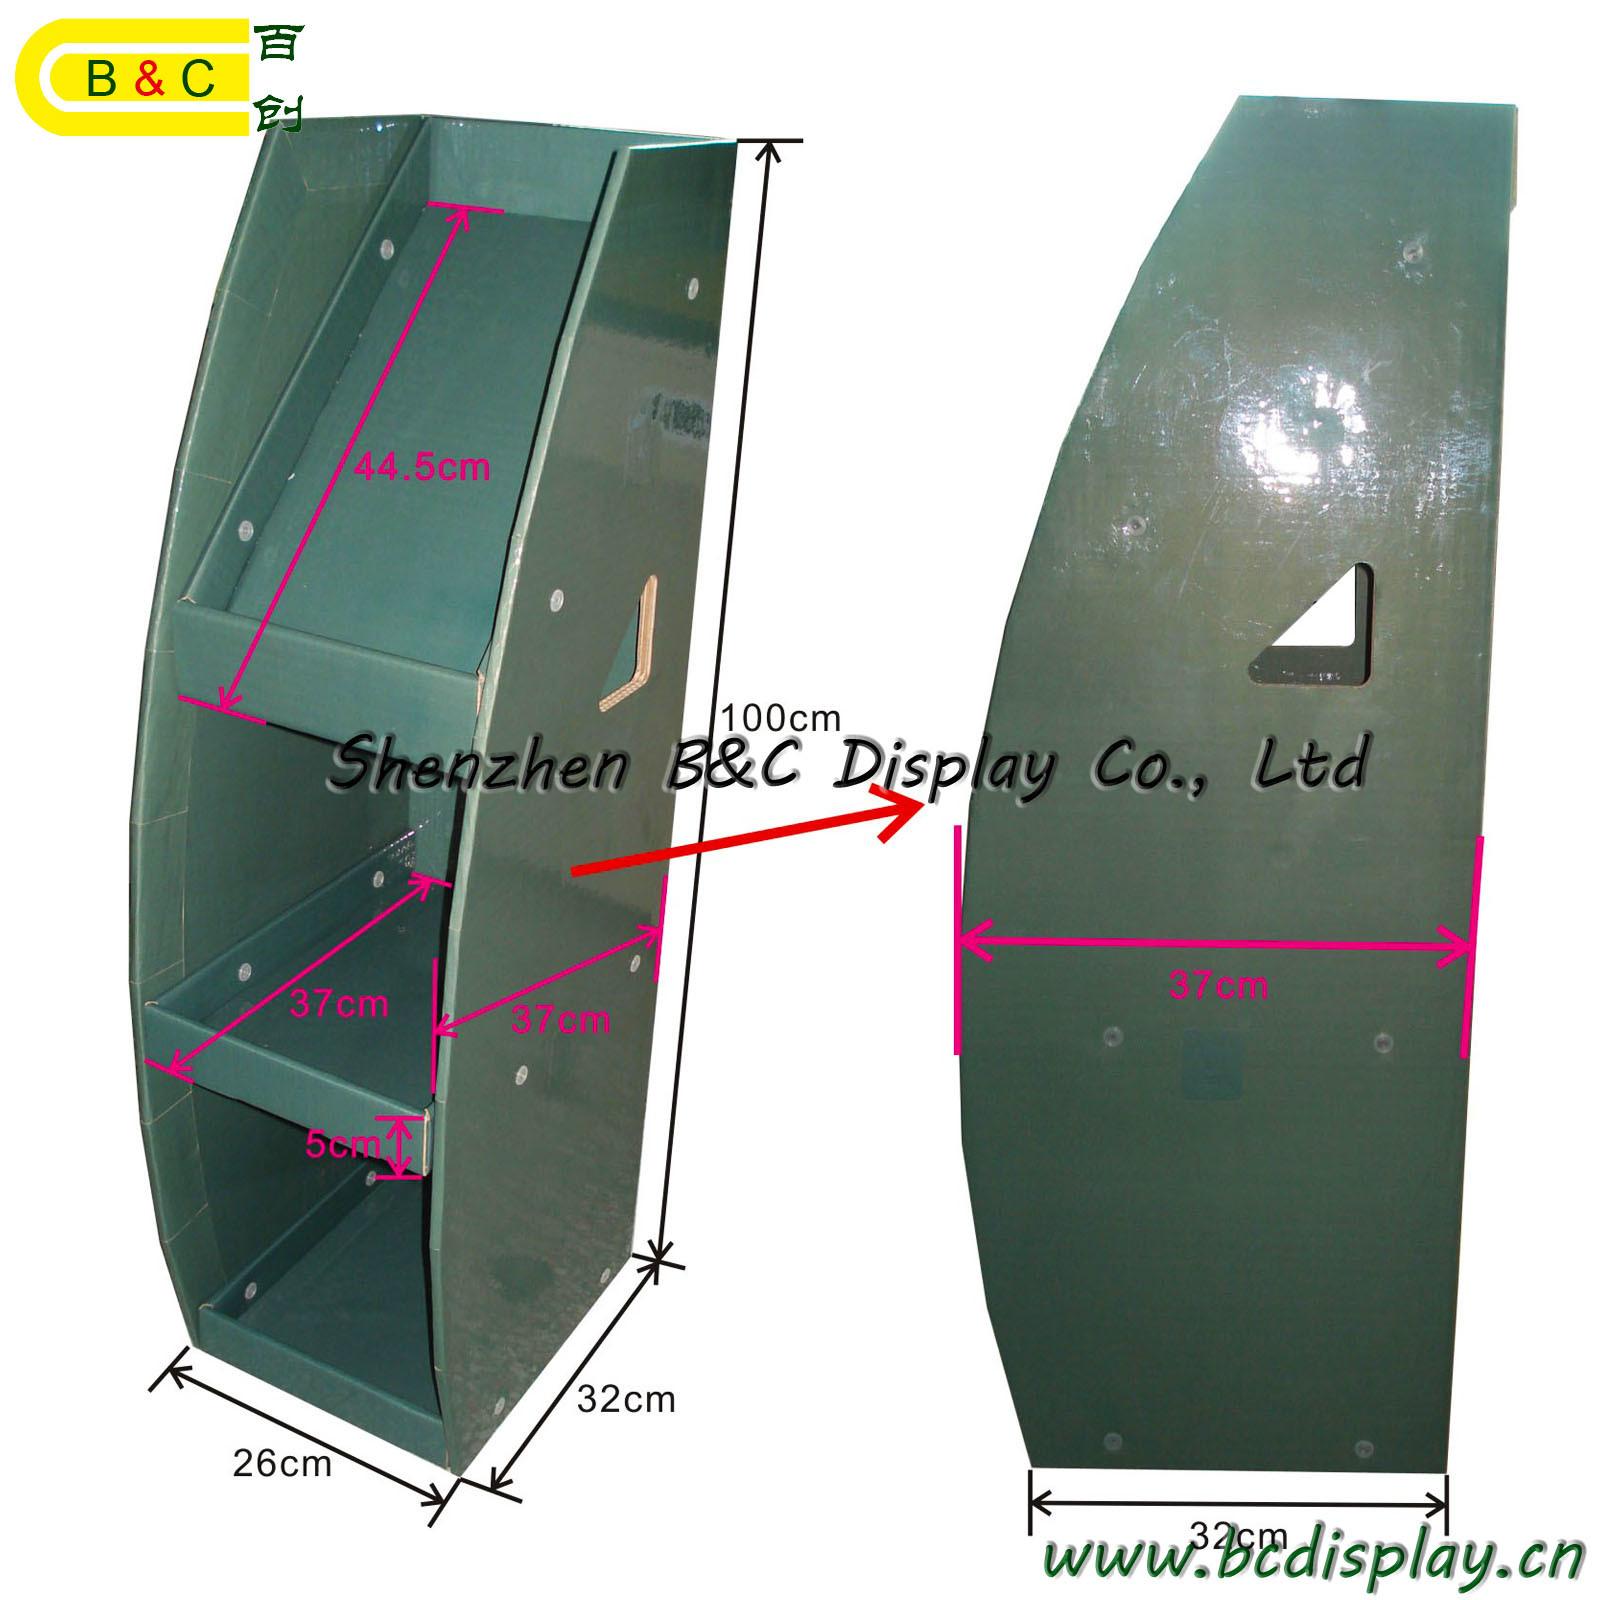 Bookrack Bookshelf Bookcase Dumpbin / Cardboard Dump Bin Display Stand (B&C-A035)